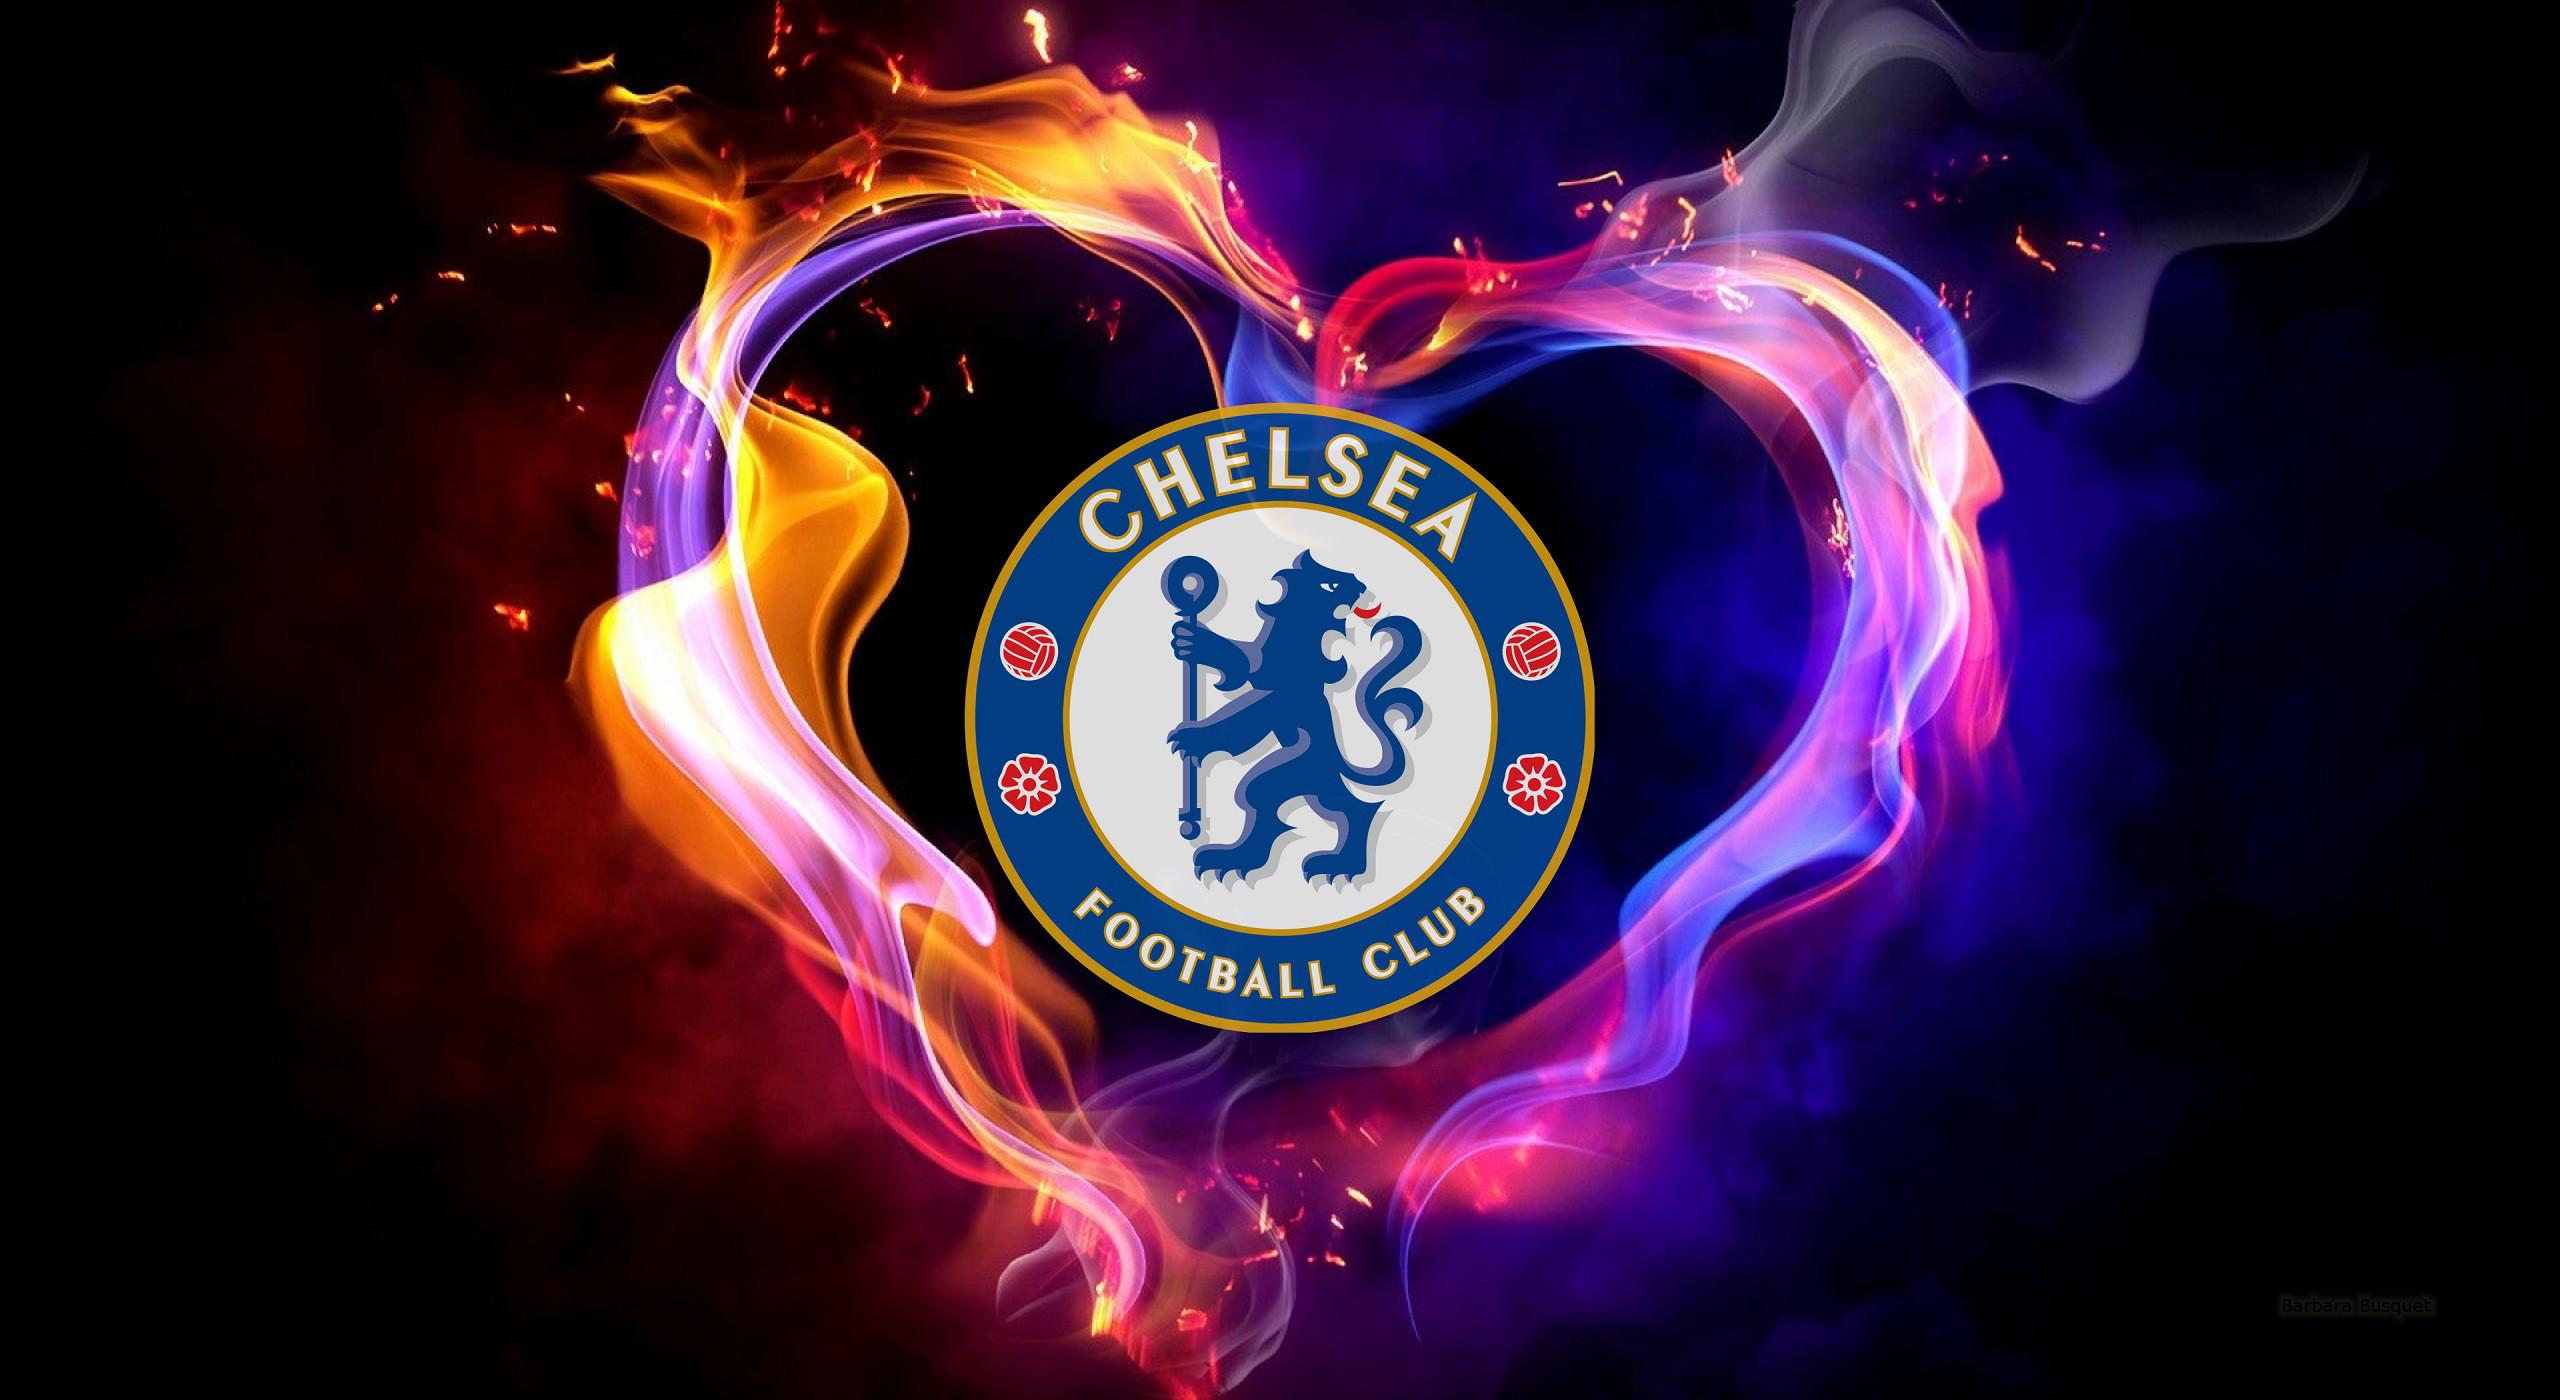 Chelsea F.C. HD Wallpaper